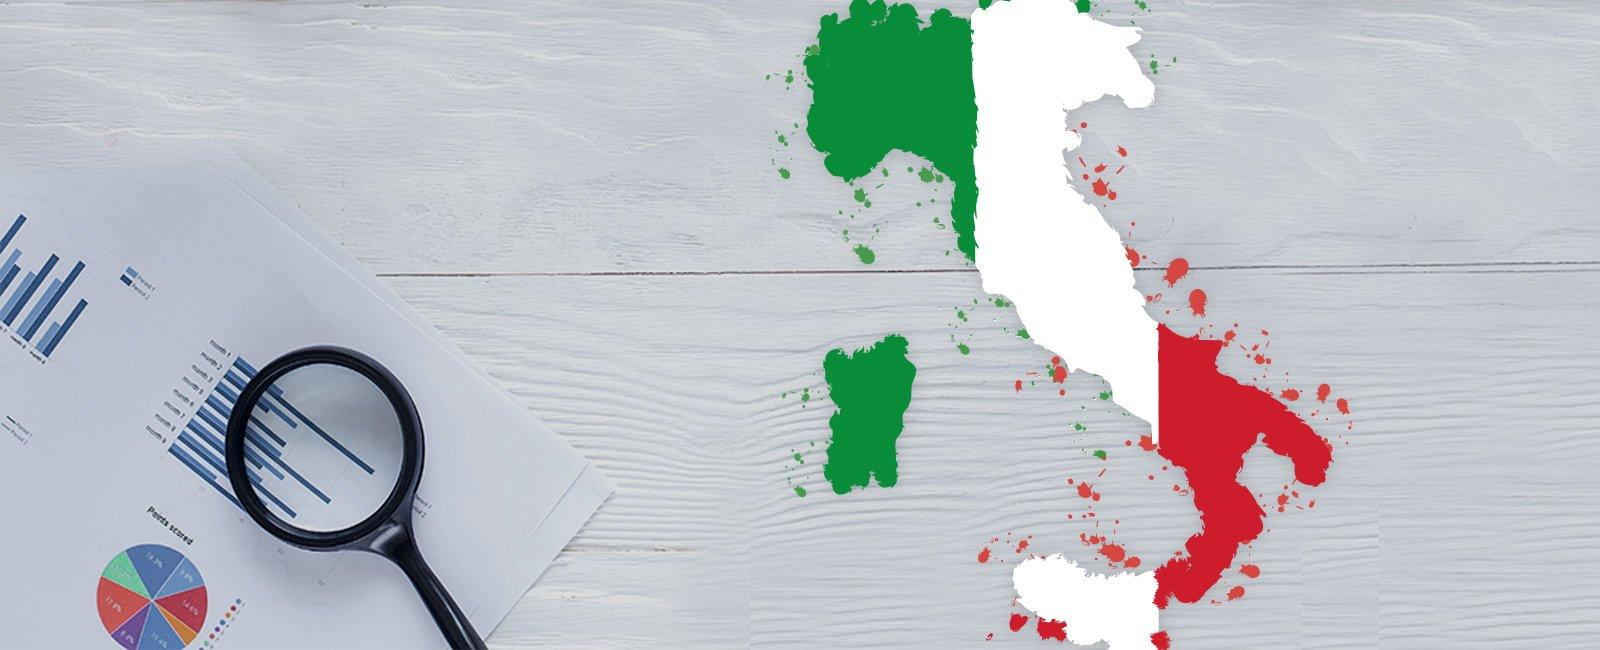 landingpage-wp-analsisi-e-commerce_italia